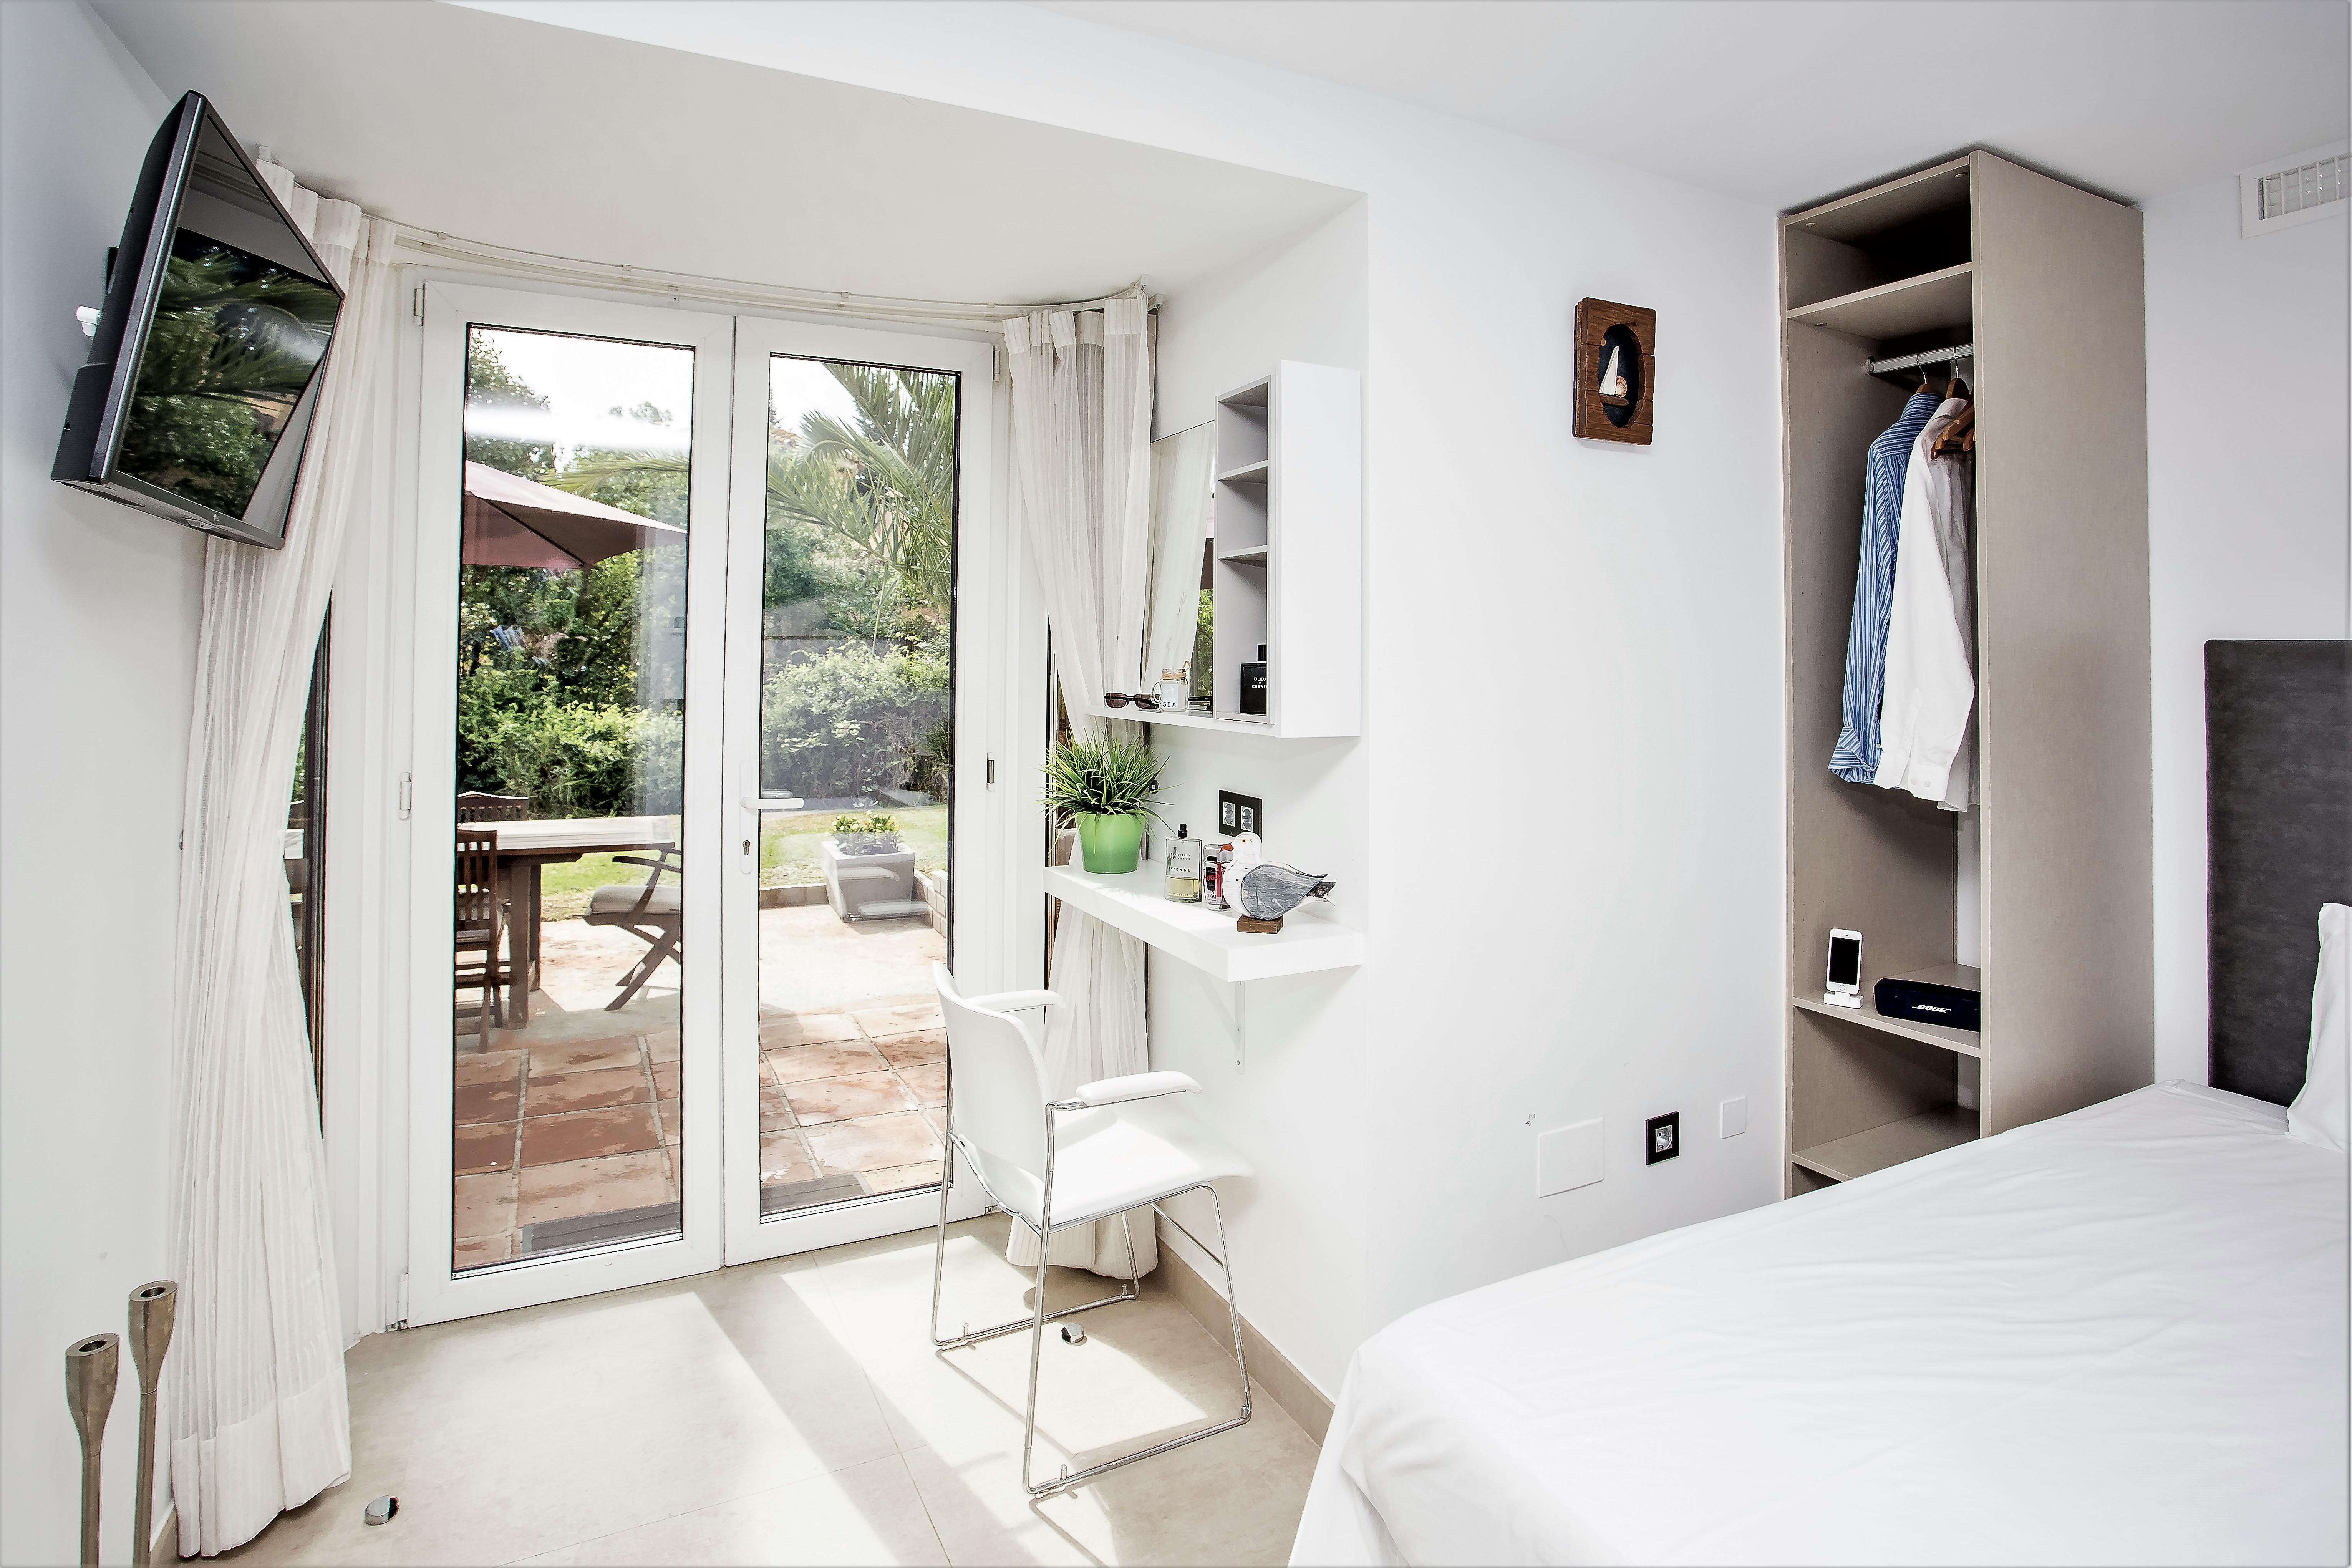 Apartment 8 Bedroom VILLA BY PUERTO BANUS   SEA 5 min                                photo 16501354